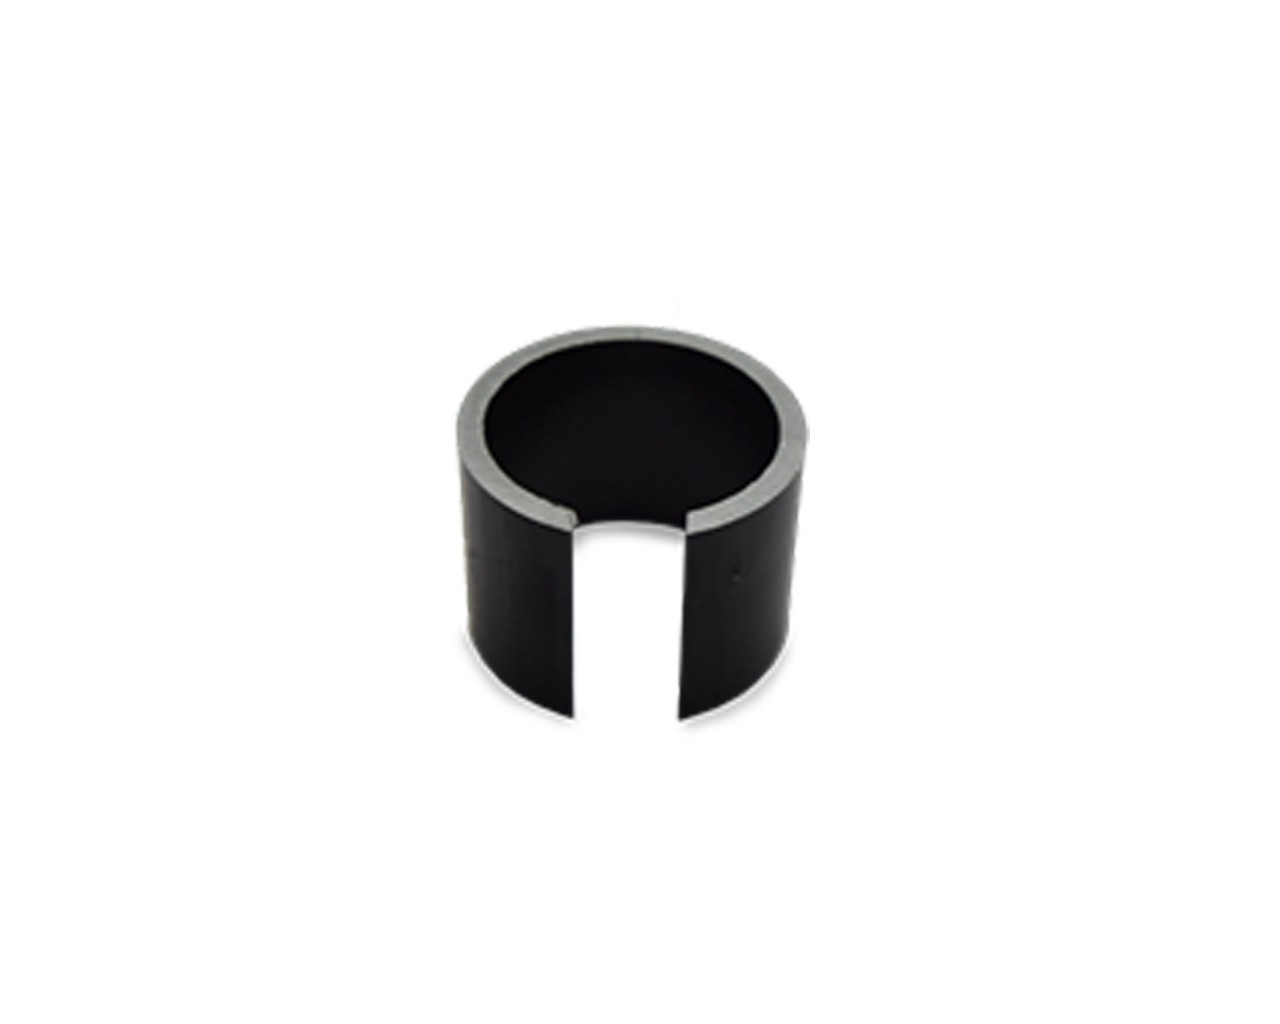 Cube Steckschutzblech-Adapter für konische Gabelschäfte | black